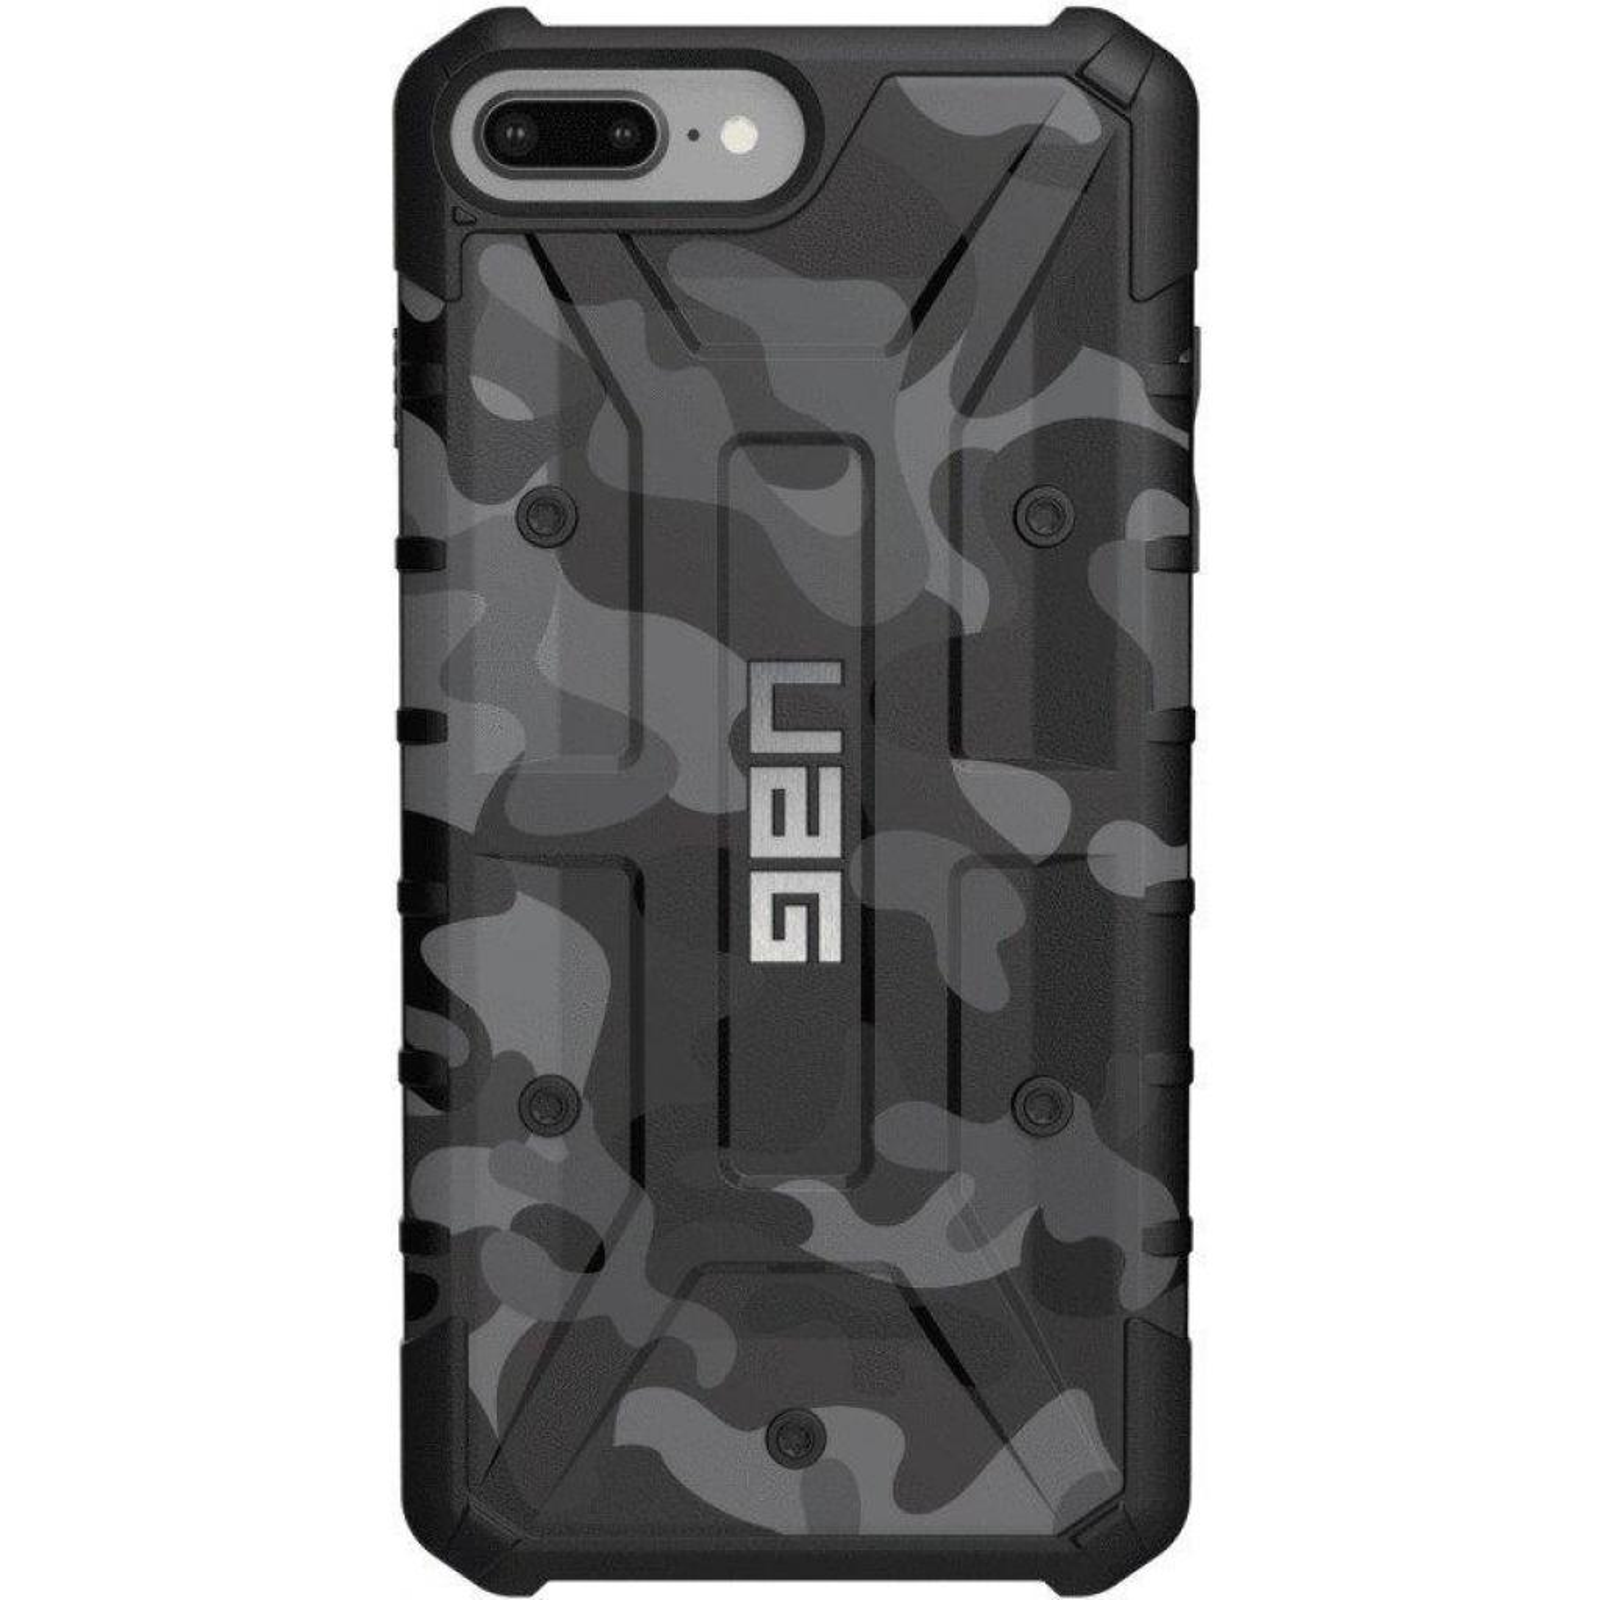 Чехол для моб. телефона Urban Armor Gear iPhone 8/7/6S Plus Pathfinder Camo Gray/Black (IPH8/7PLS-A-BC)